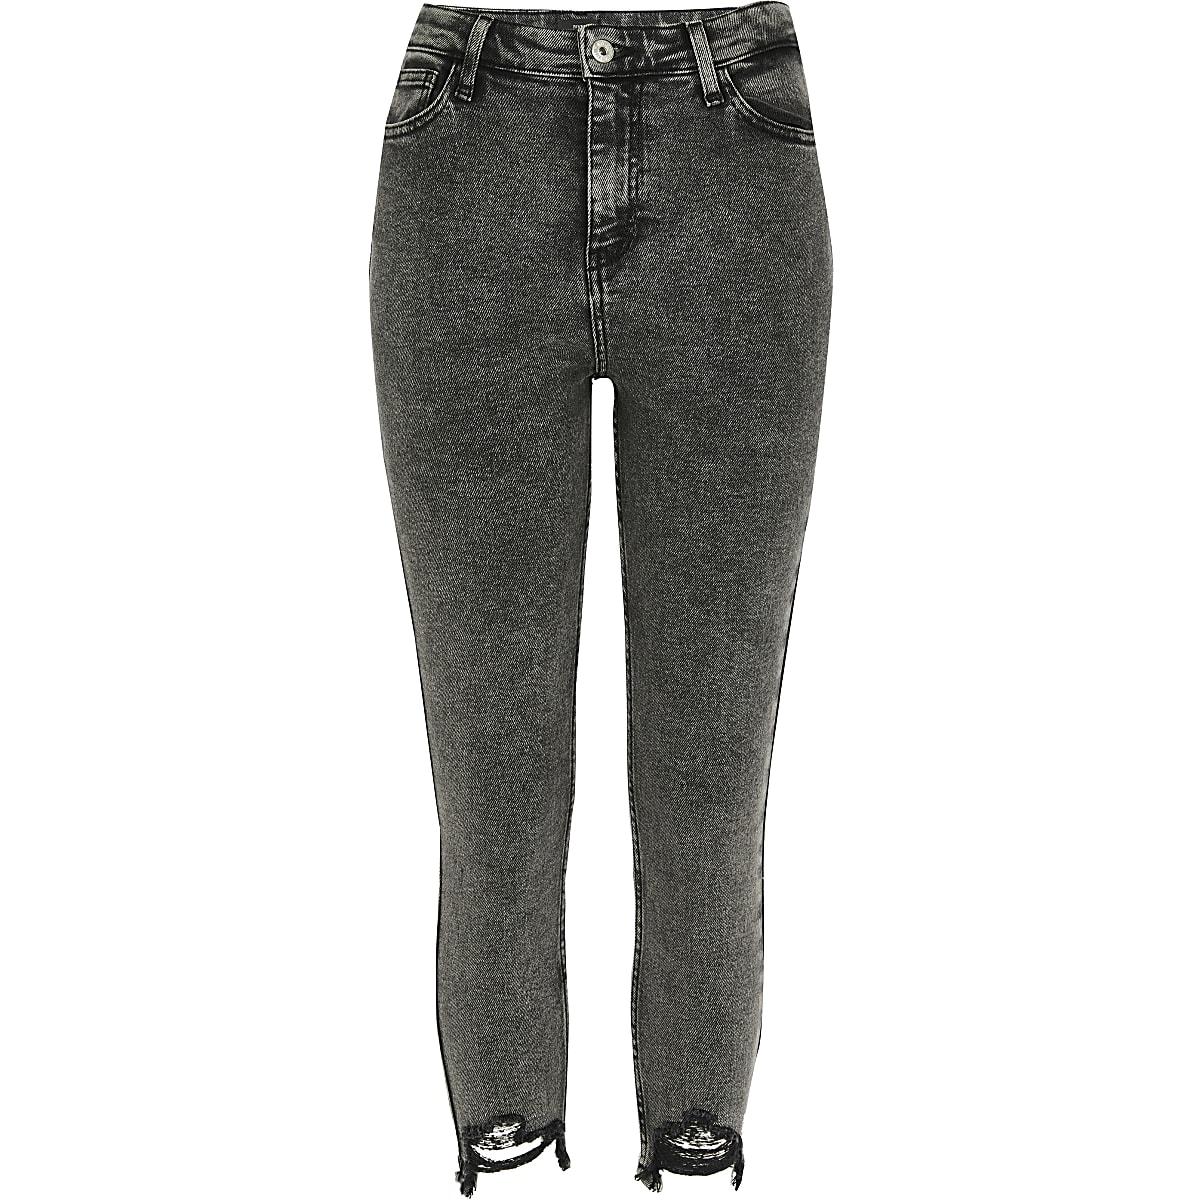 RI Petite - Hailey - Donkergrijze jeans met hoge taille